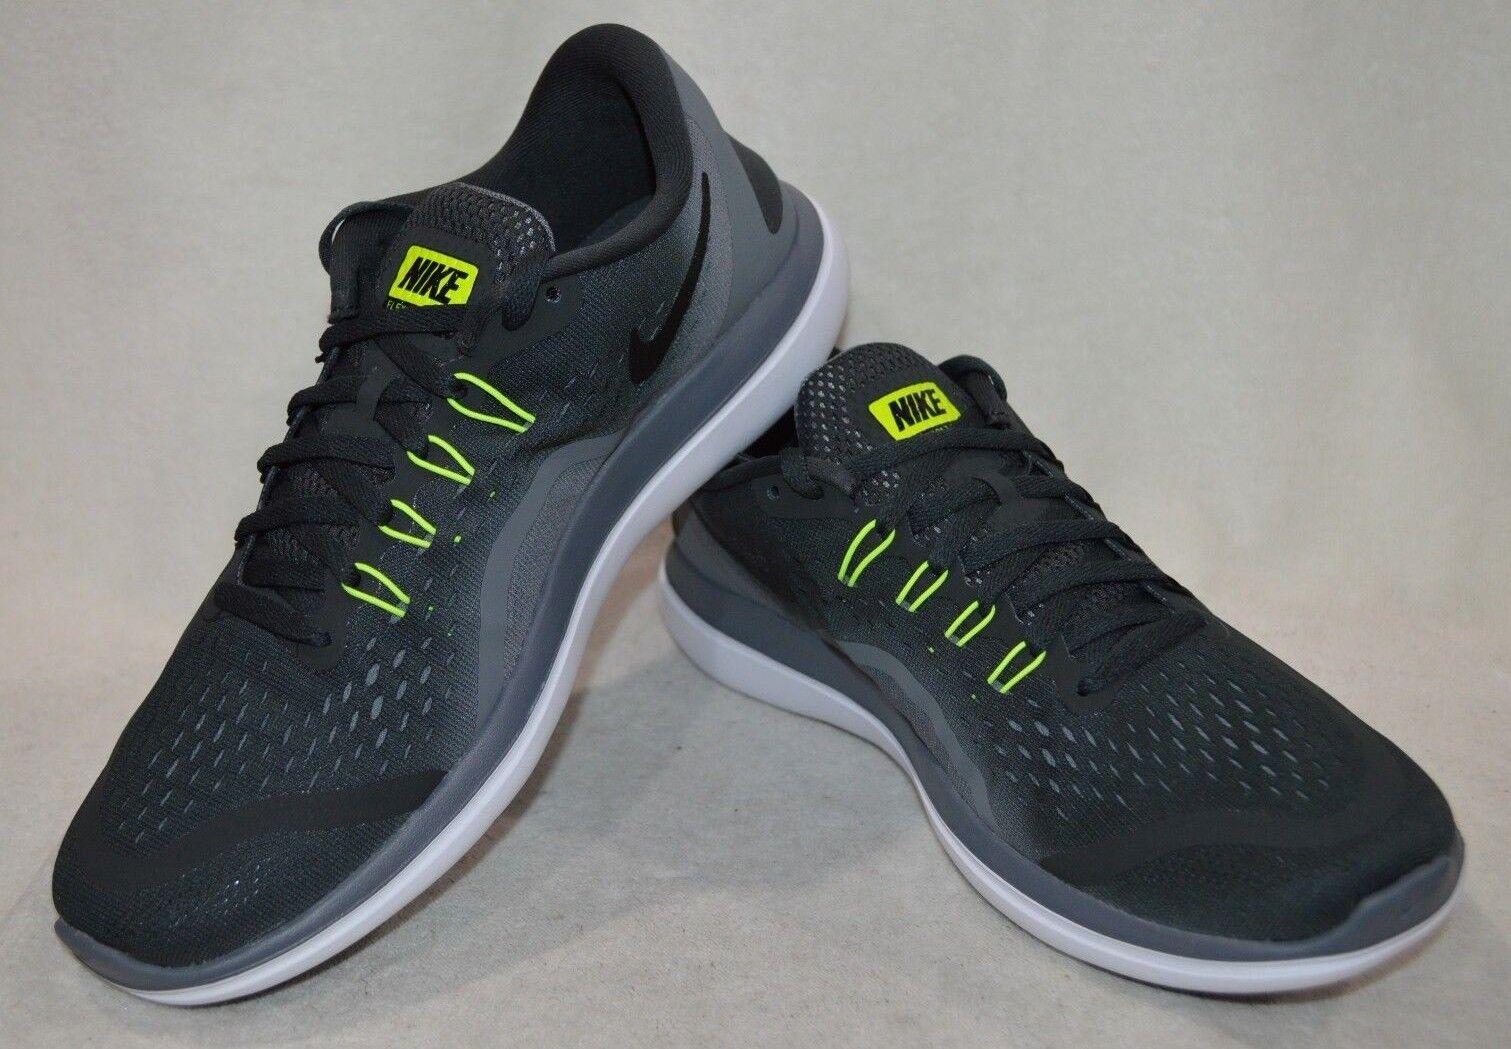 Nike Men's Flex 2017 RN Anthracite/Volt/Grey Running Shoes-Assorted Sizes NWB